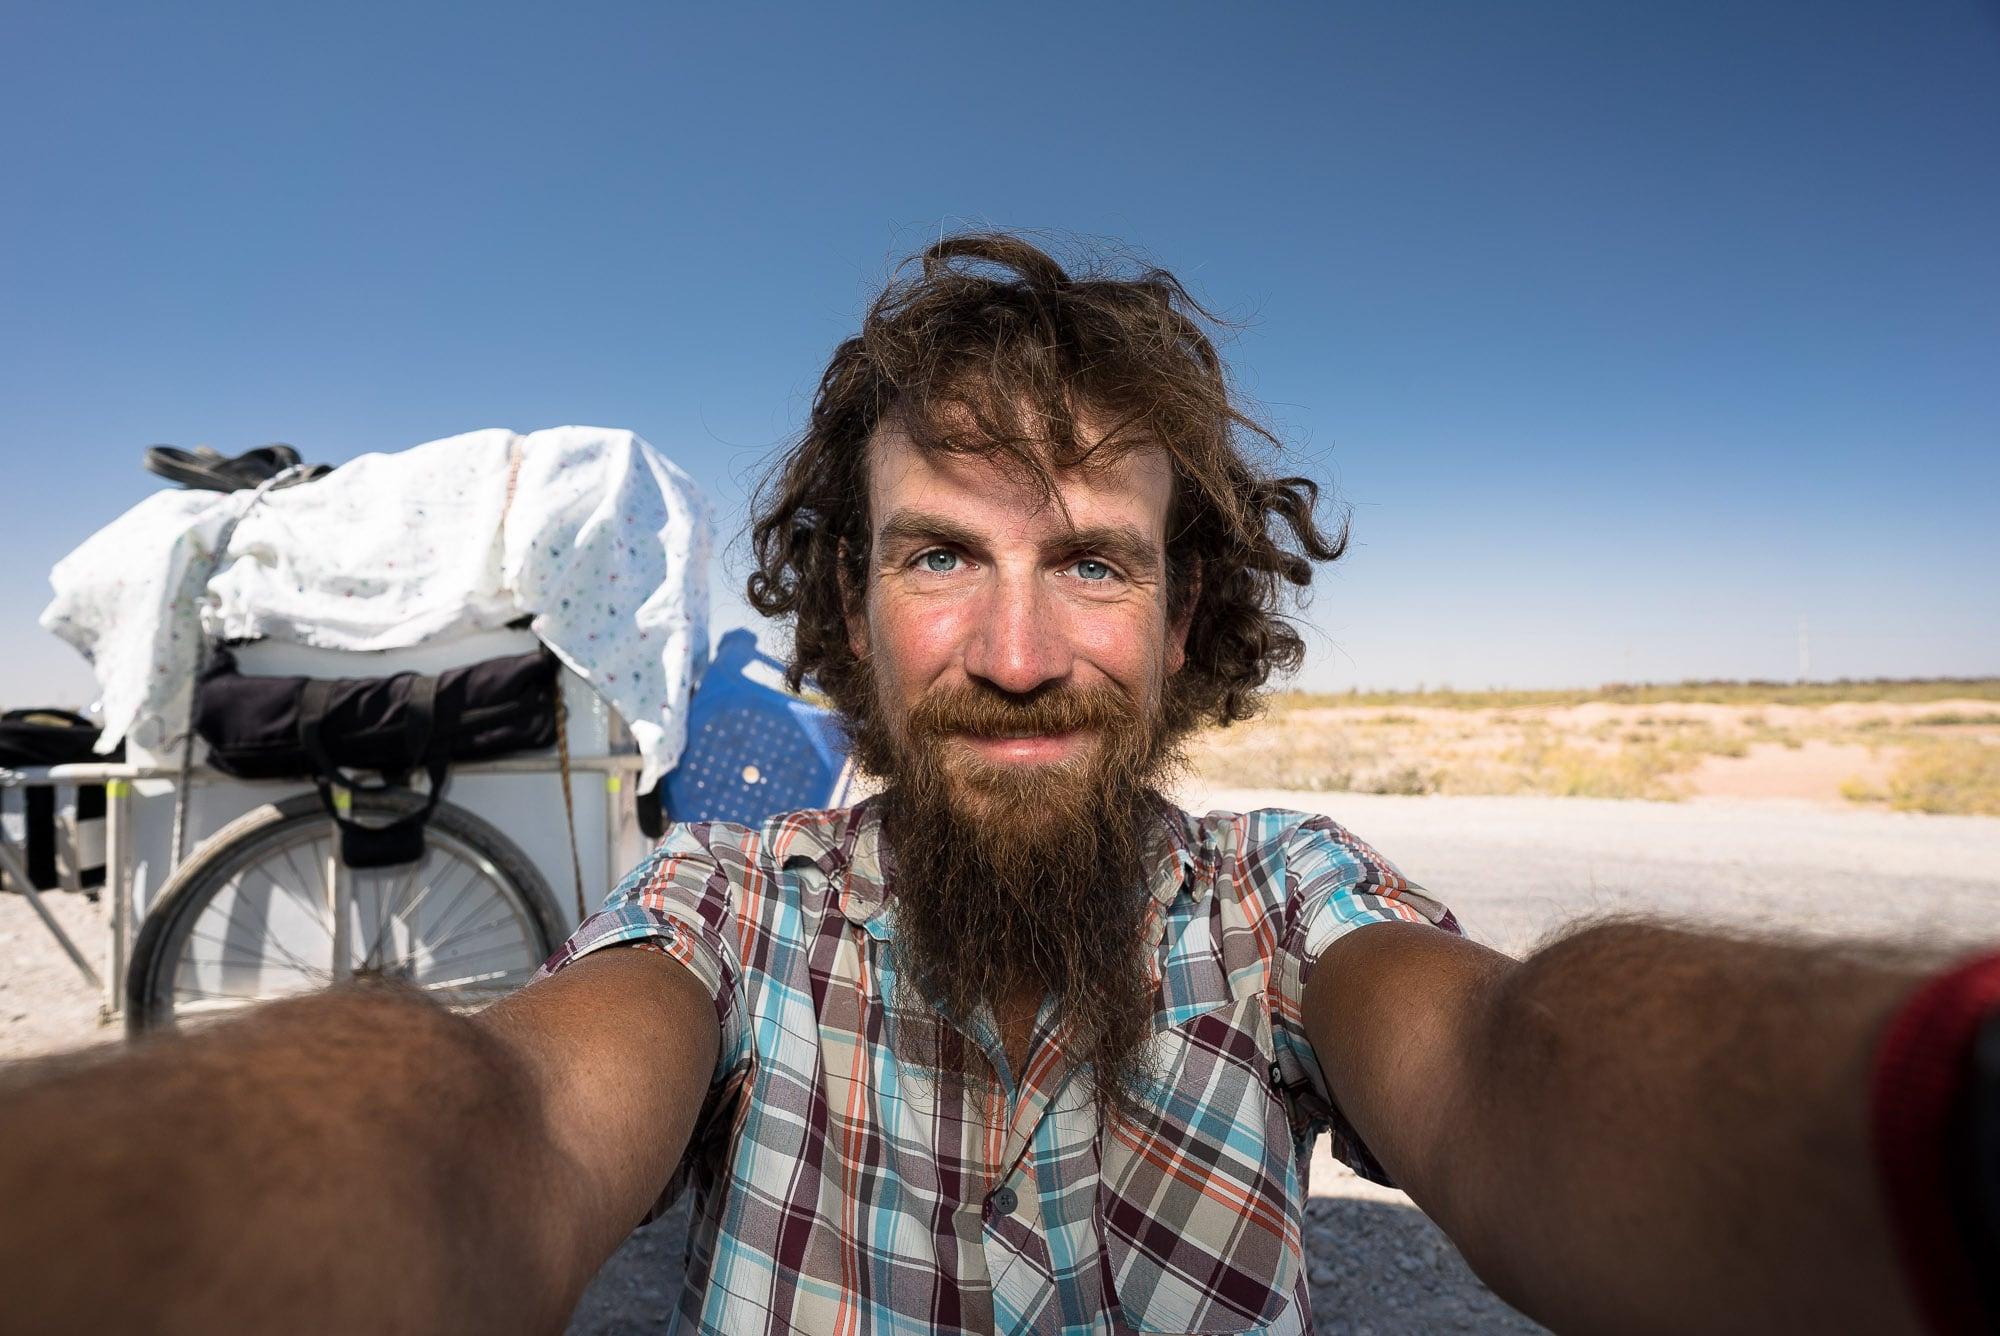 8000km face